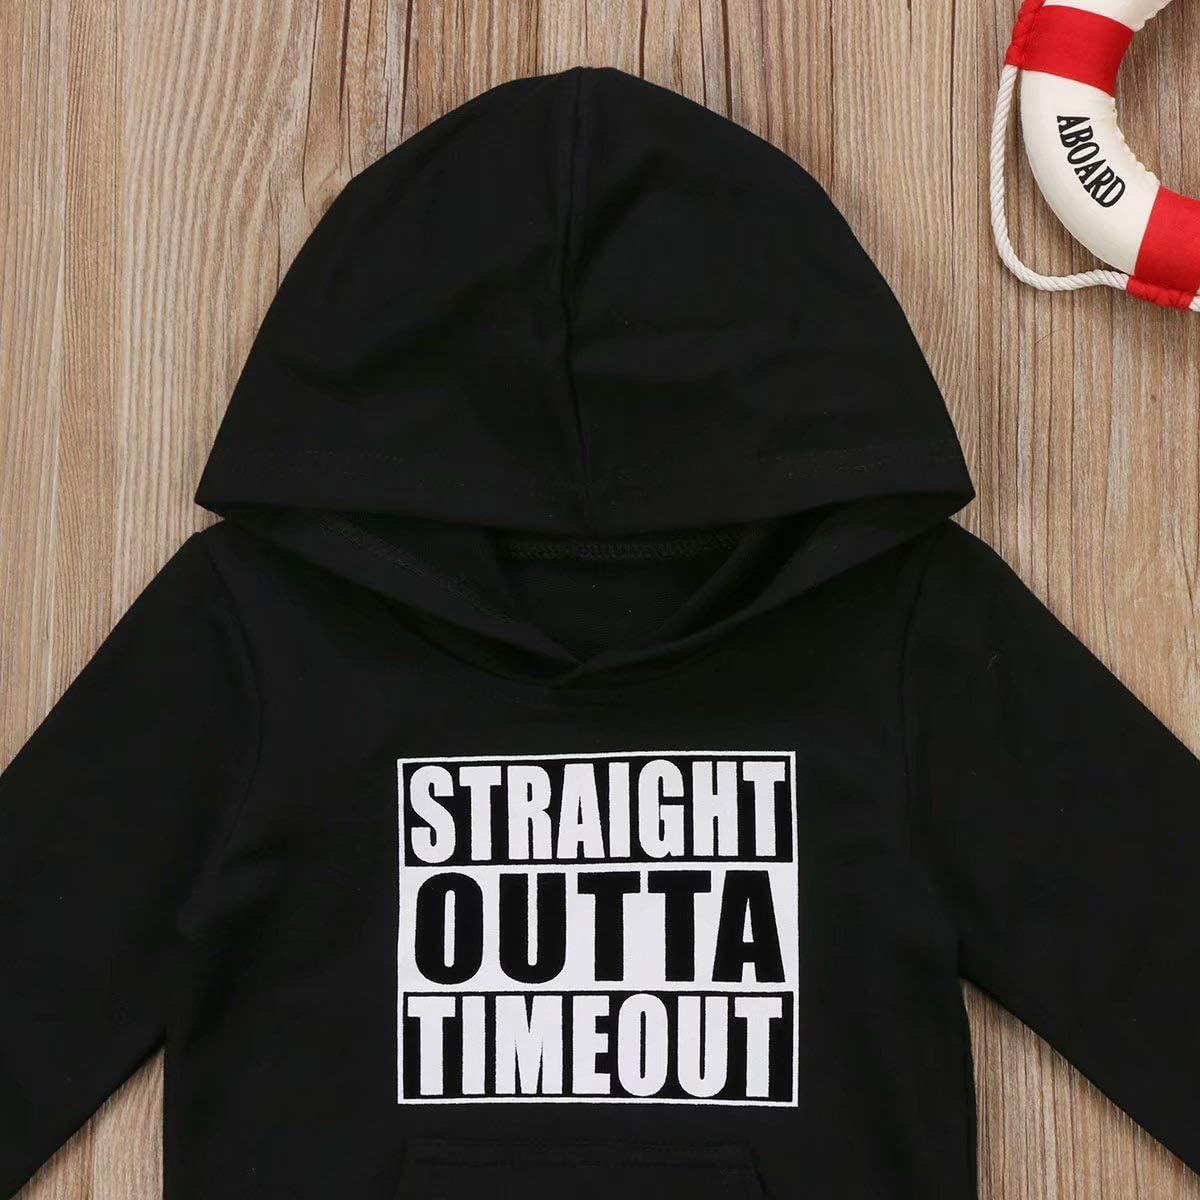 Geagodelia Kid Infant Twin Baby Boy Girl Sweatshirt Long Sleeve Hooded Jumper Hoodie Autumn Cotton Clothes 0-5Y